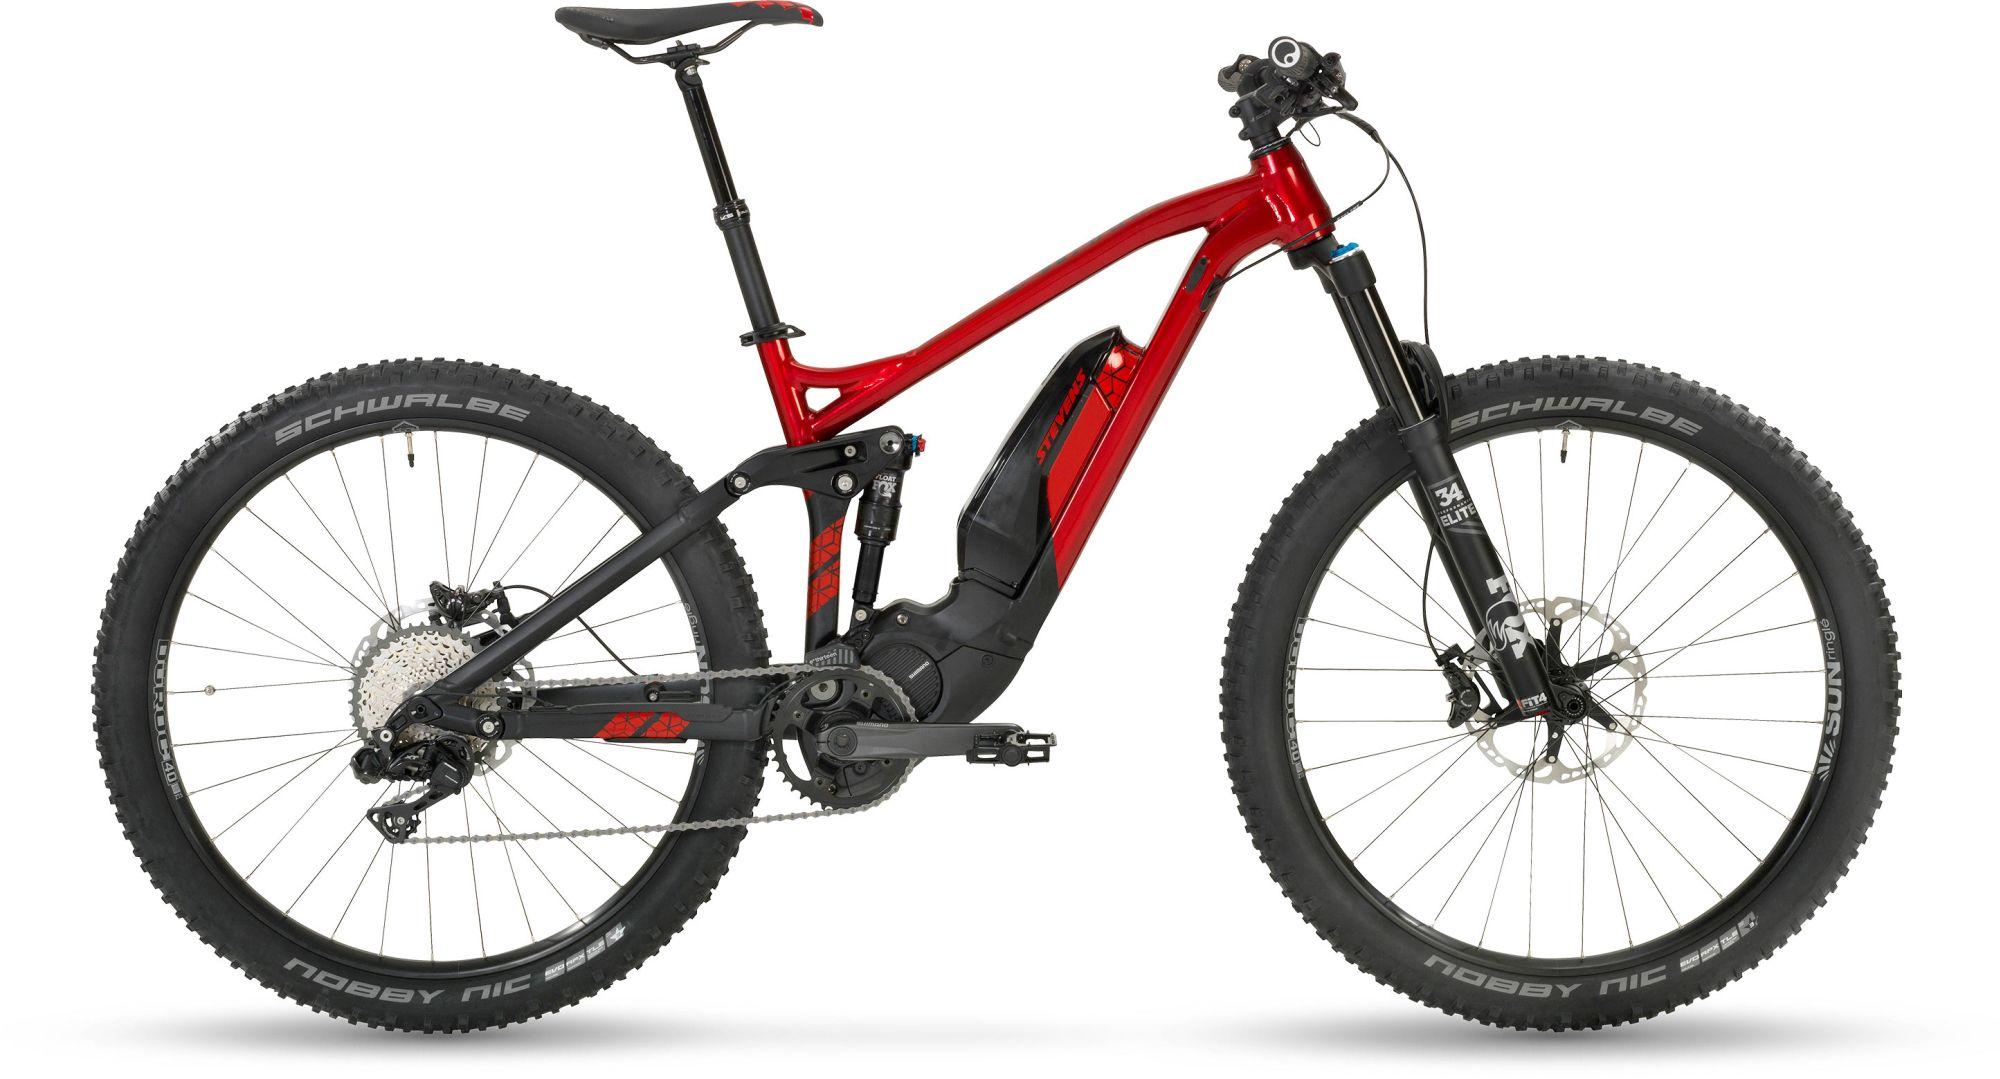 stevens 2017 e whaka es 27 5 e mtb stevens bikes. Black Bedroom Furniture Sets. Home Design Ideas